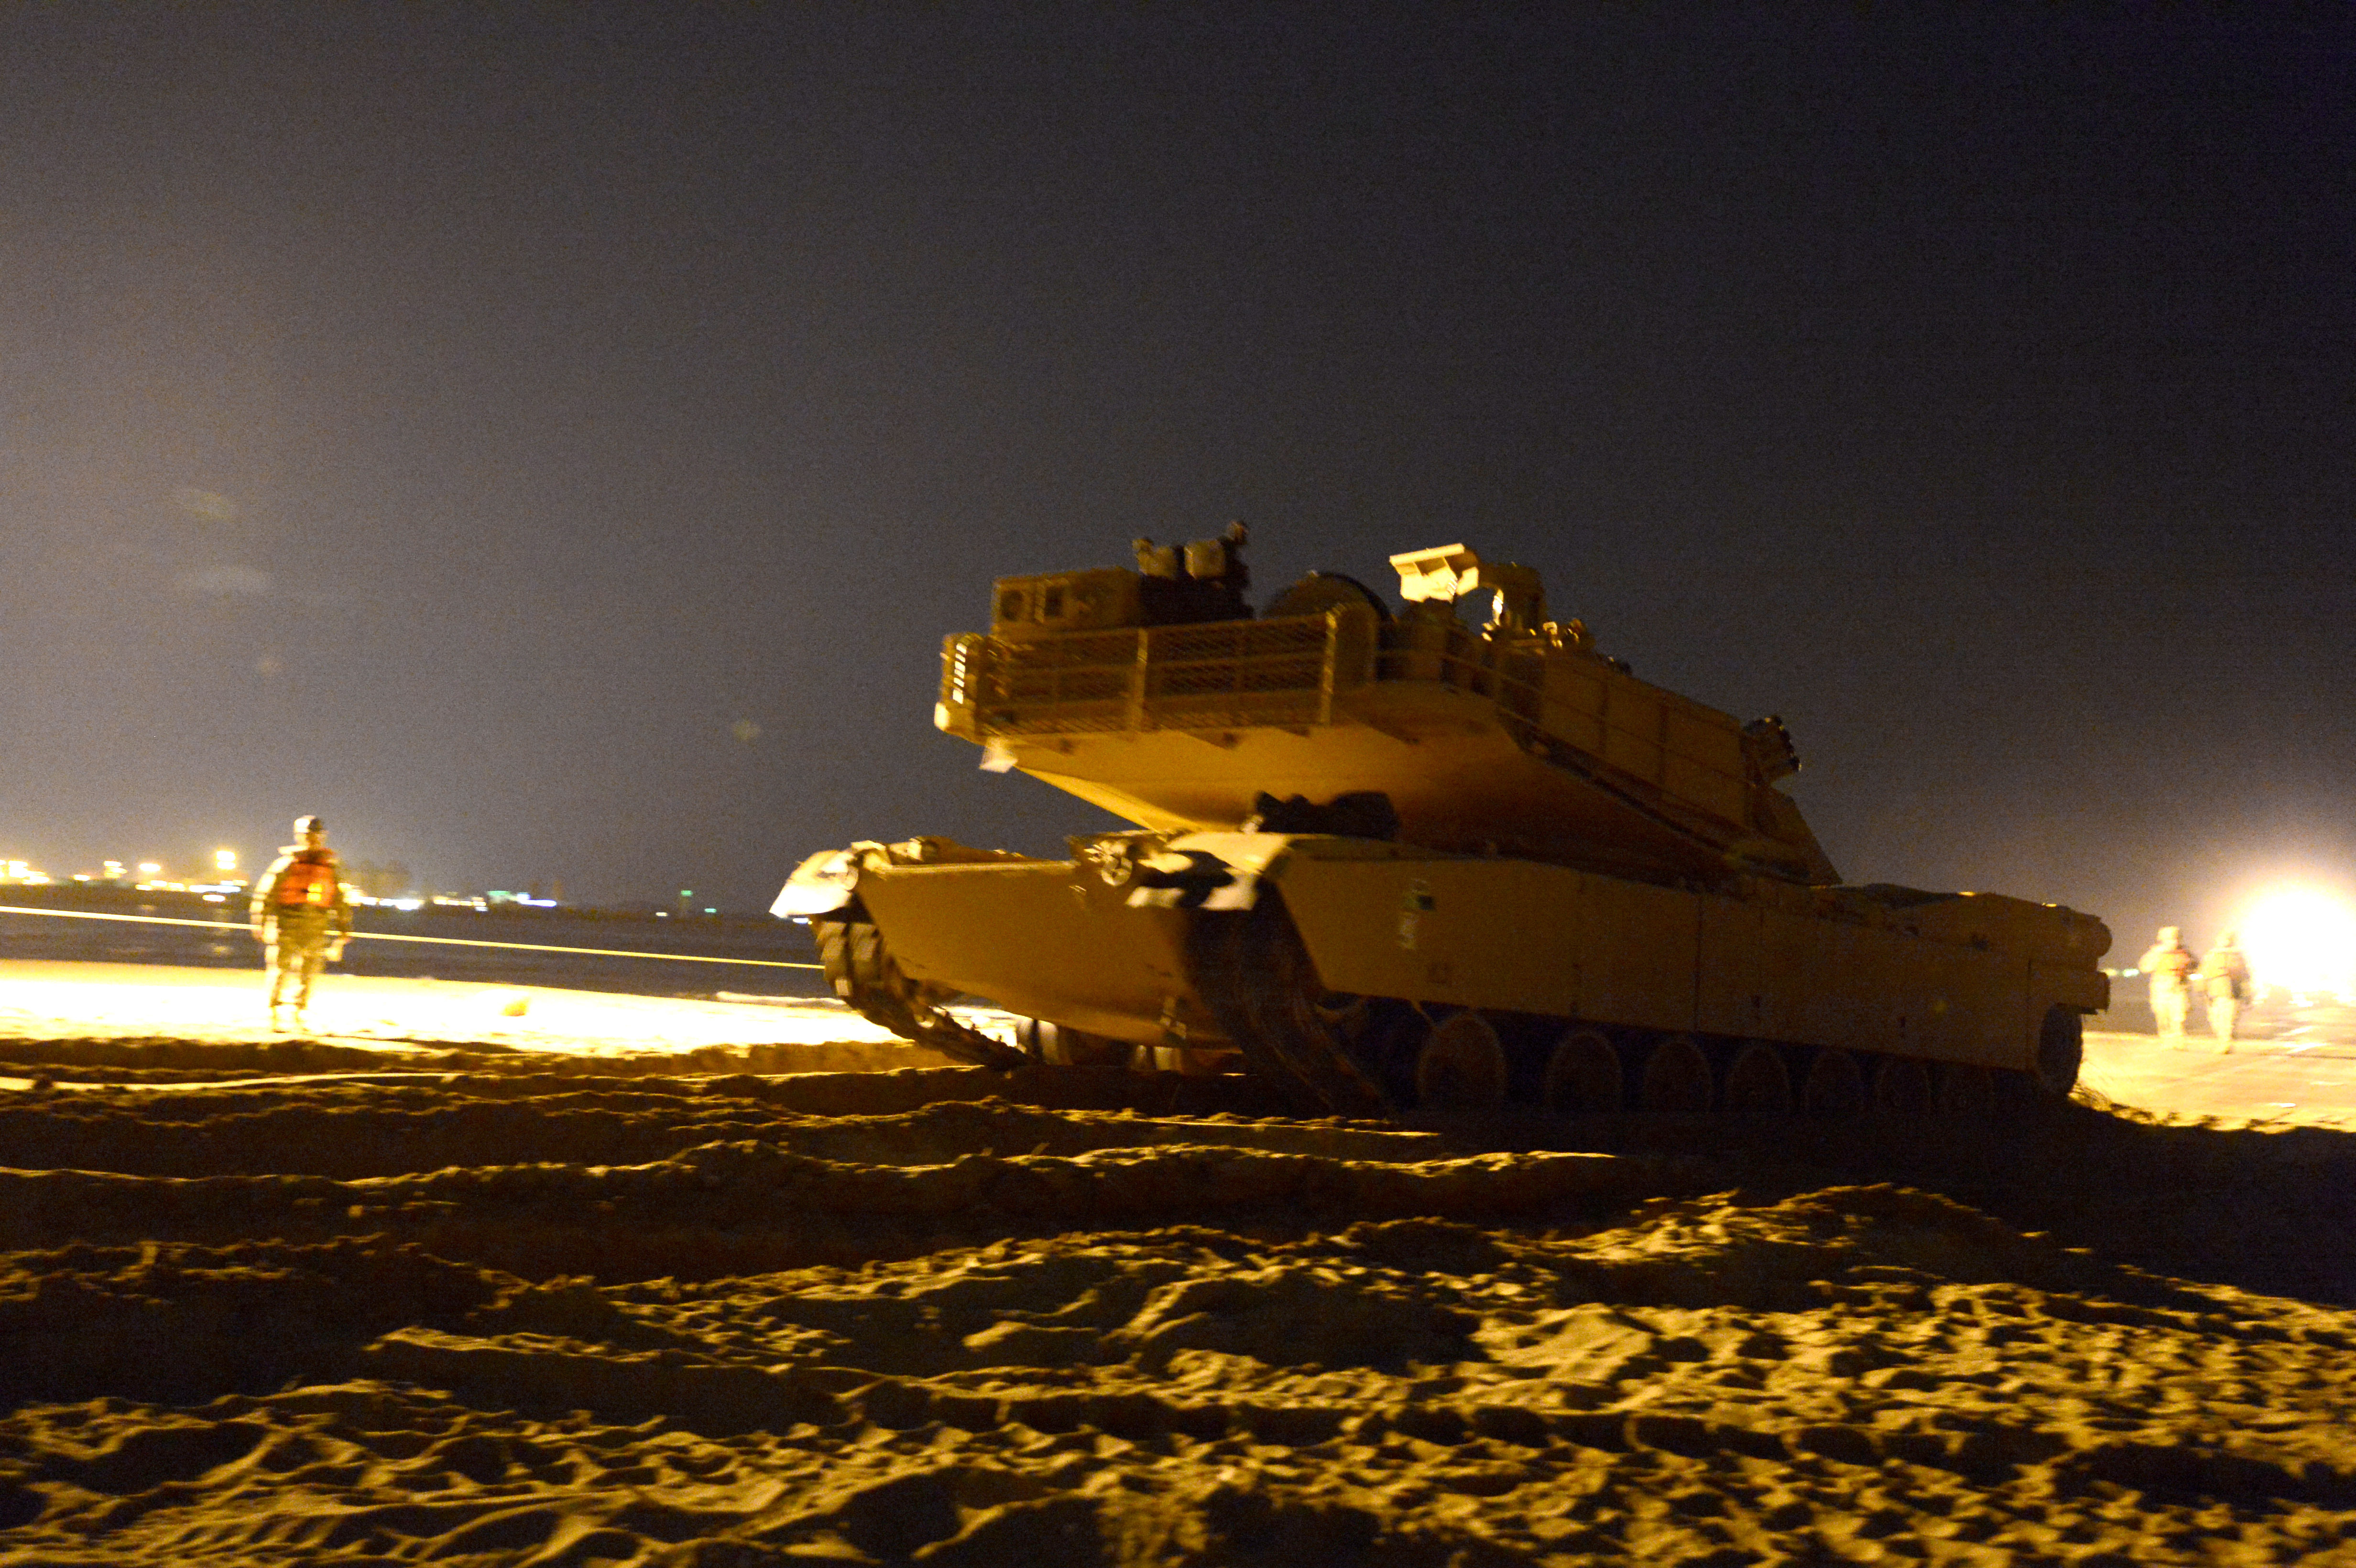 file a u s  marine corps m1a1 abrams tank maneuvers